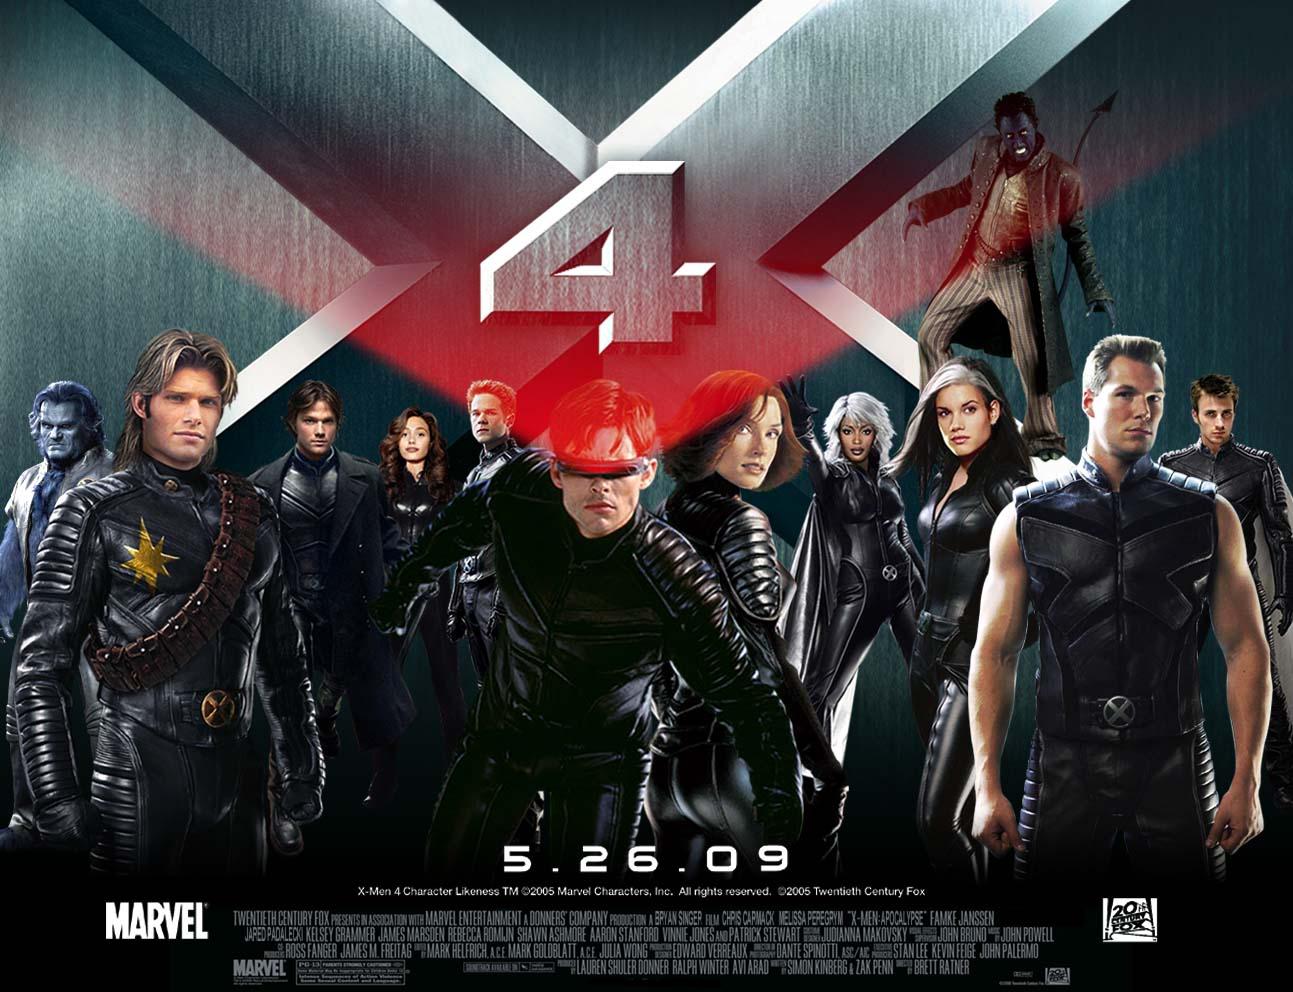 X-MEN 4 เอ็กซ์ เม็น ศึกมนุษย์พลังเหนือโลก ภาค 4 HD 2009 FullHD1080p